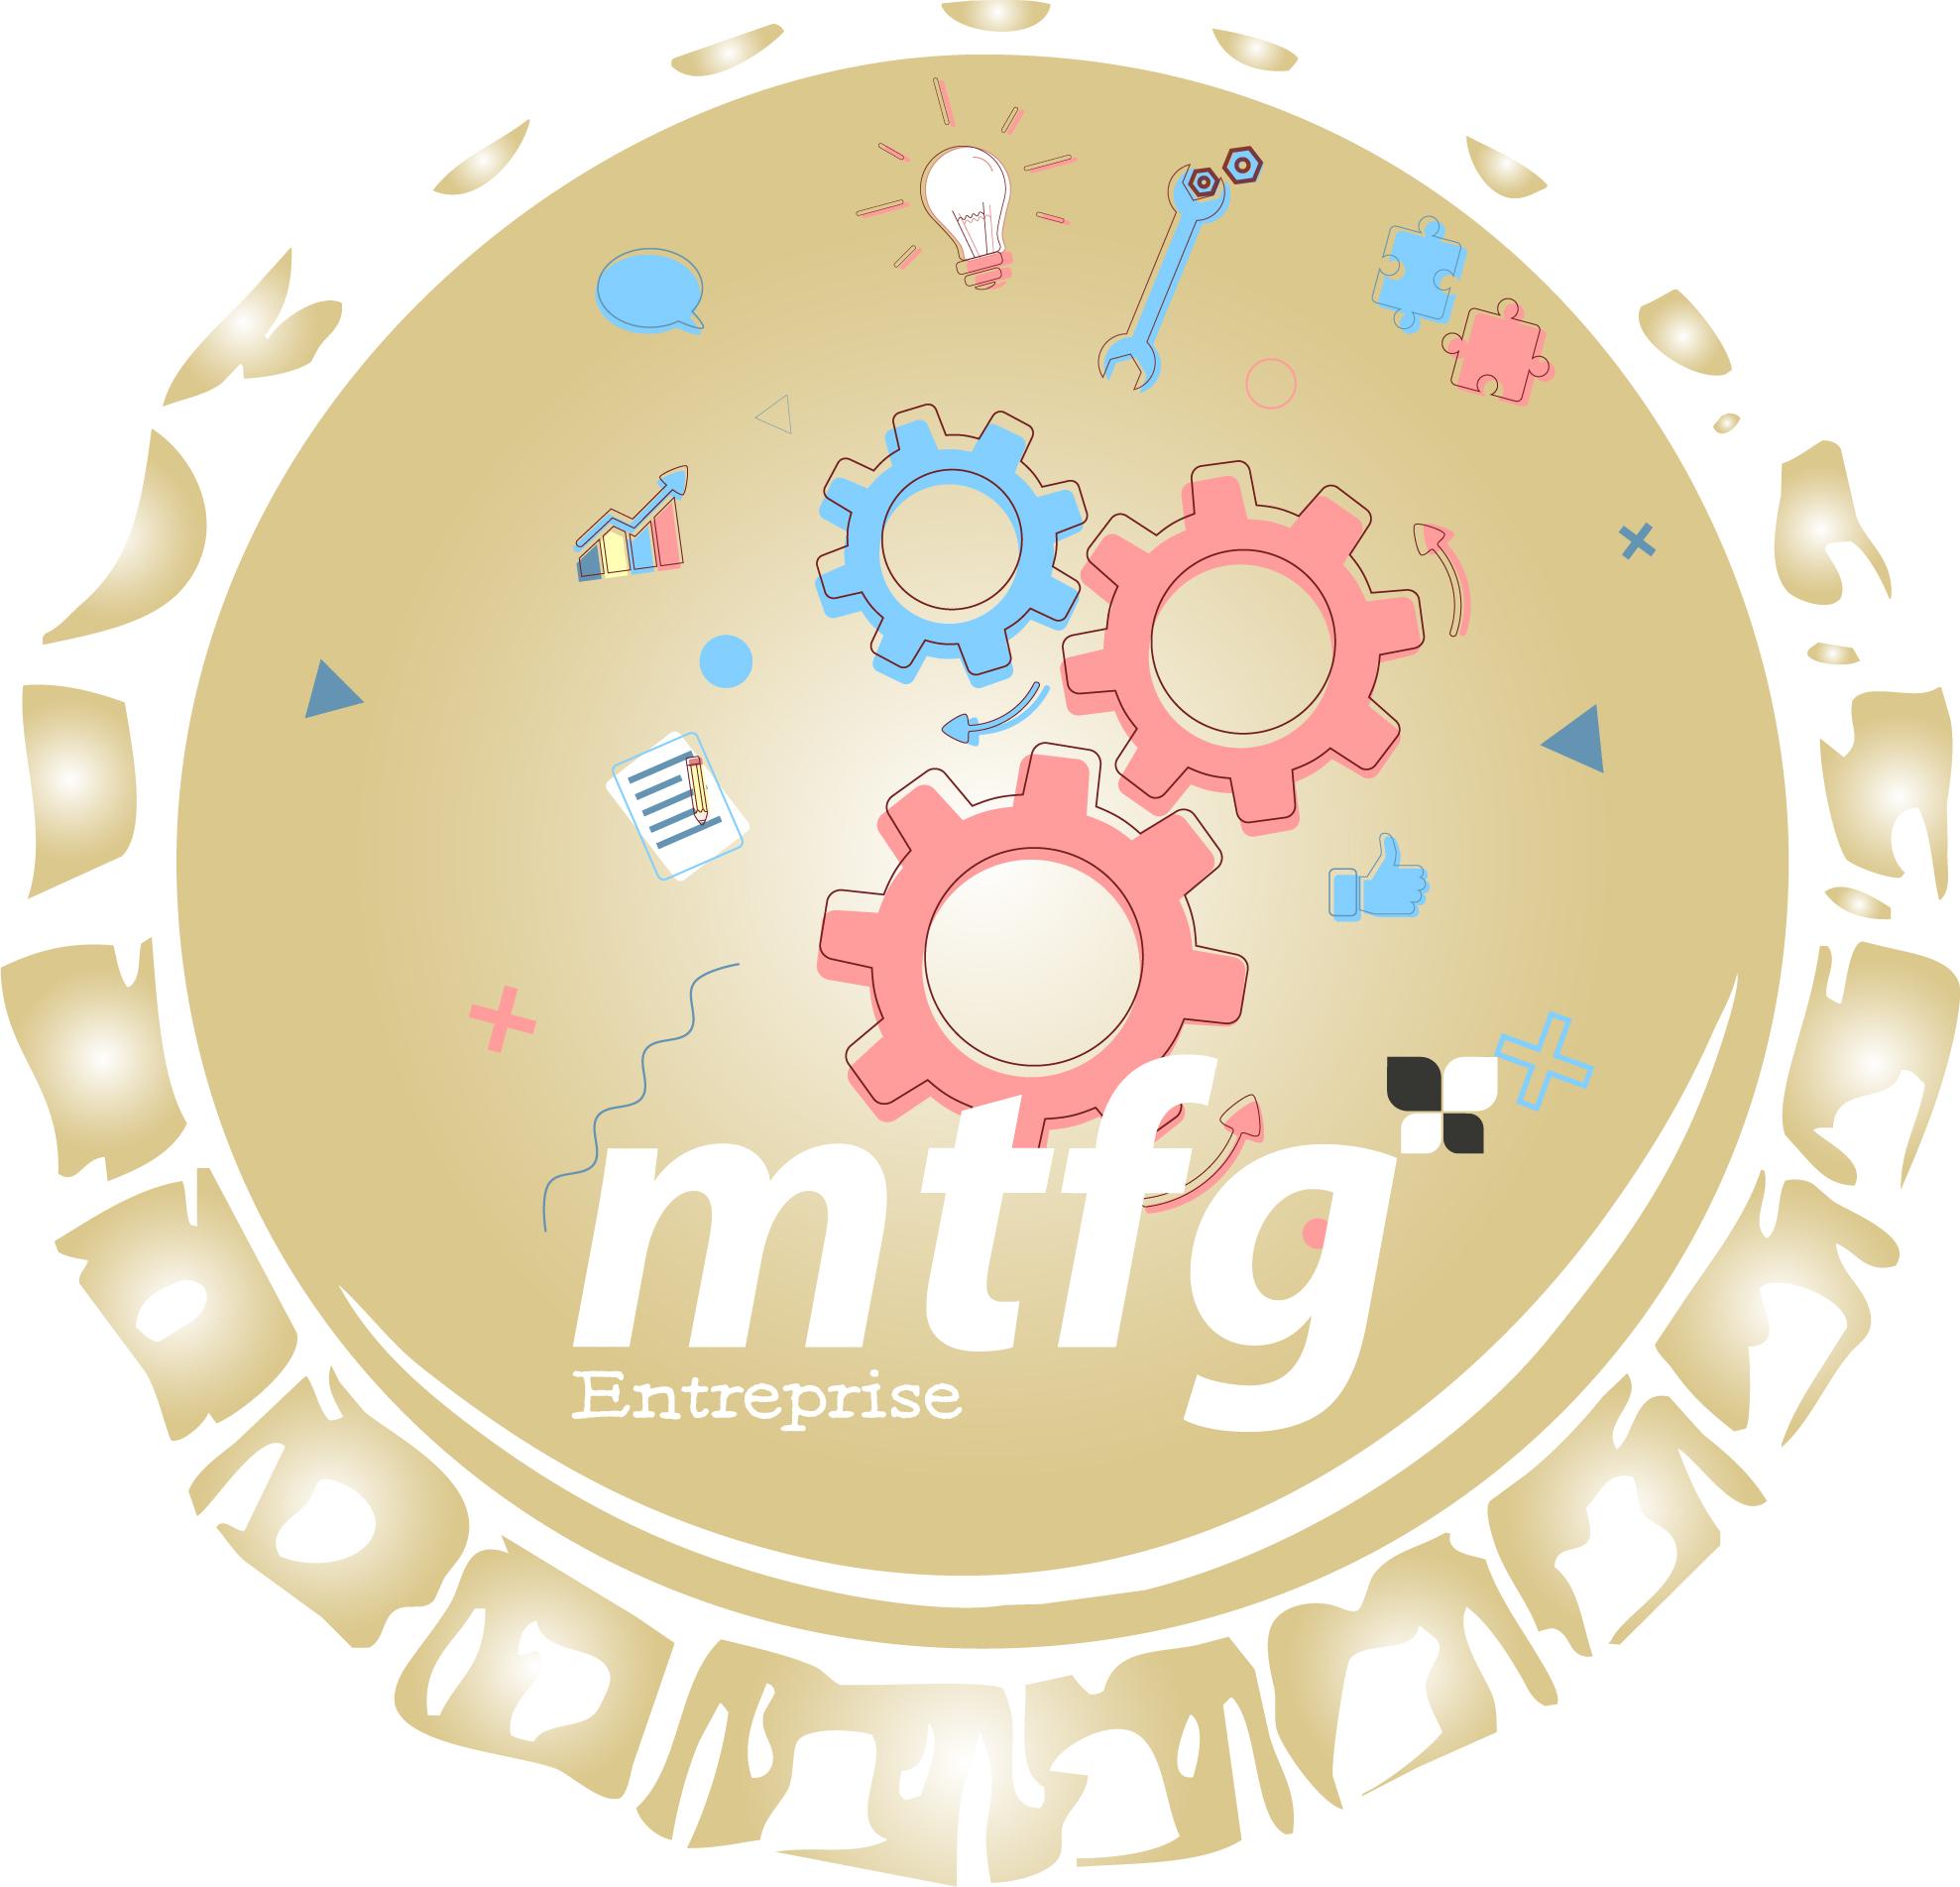 MTFG Entreprise